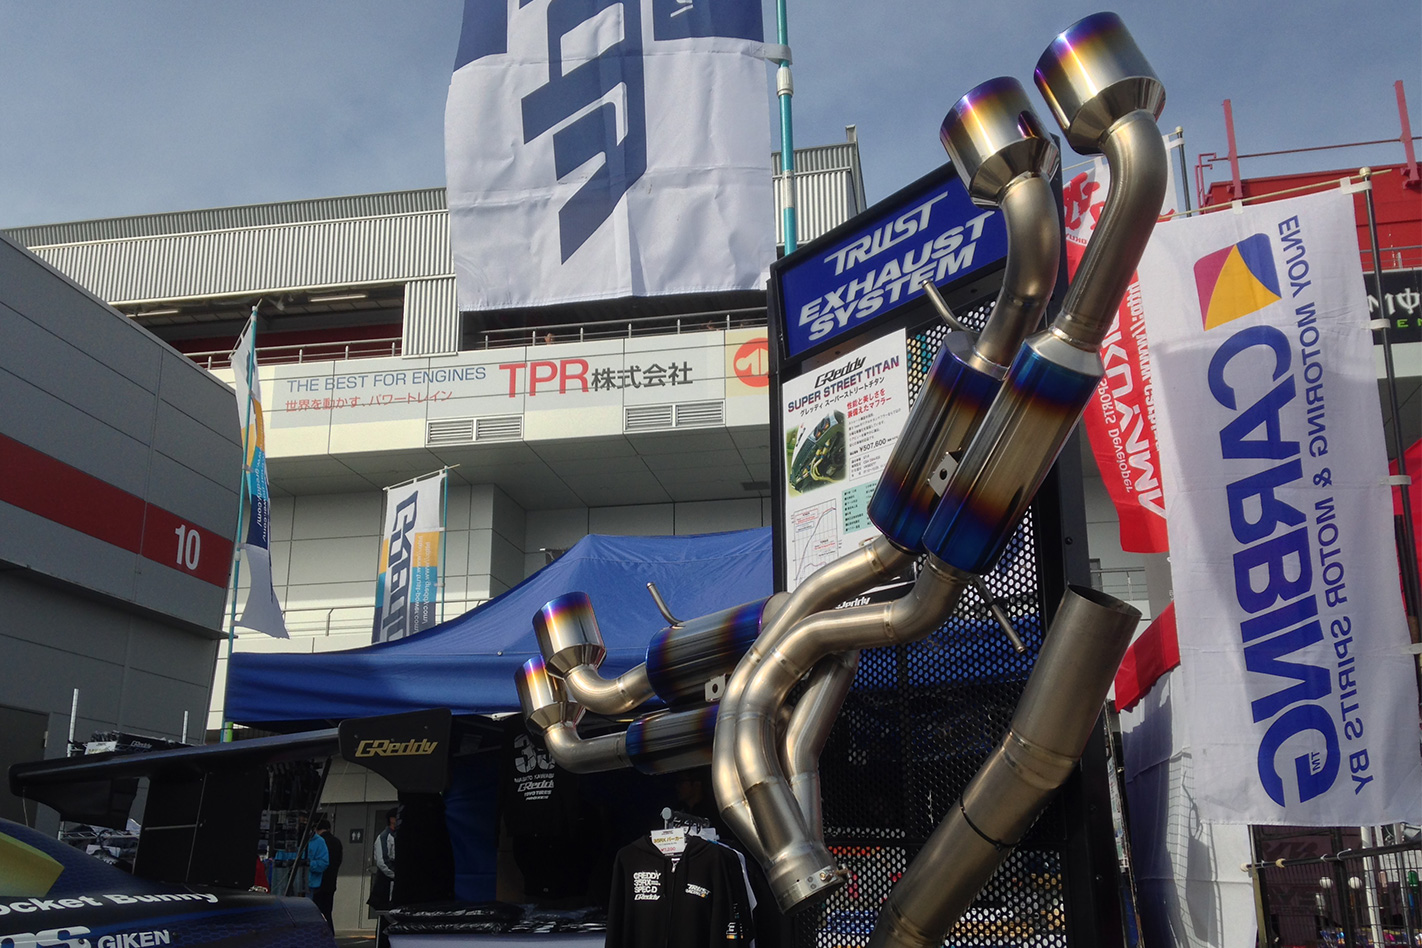 exhibitors selling parts